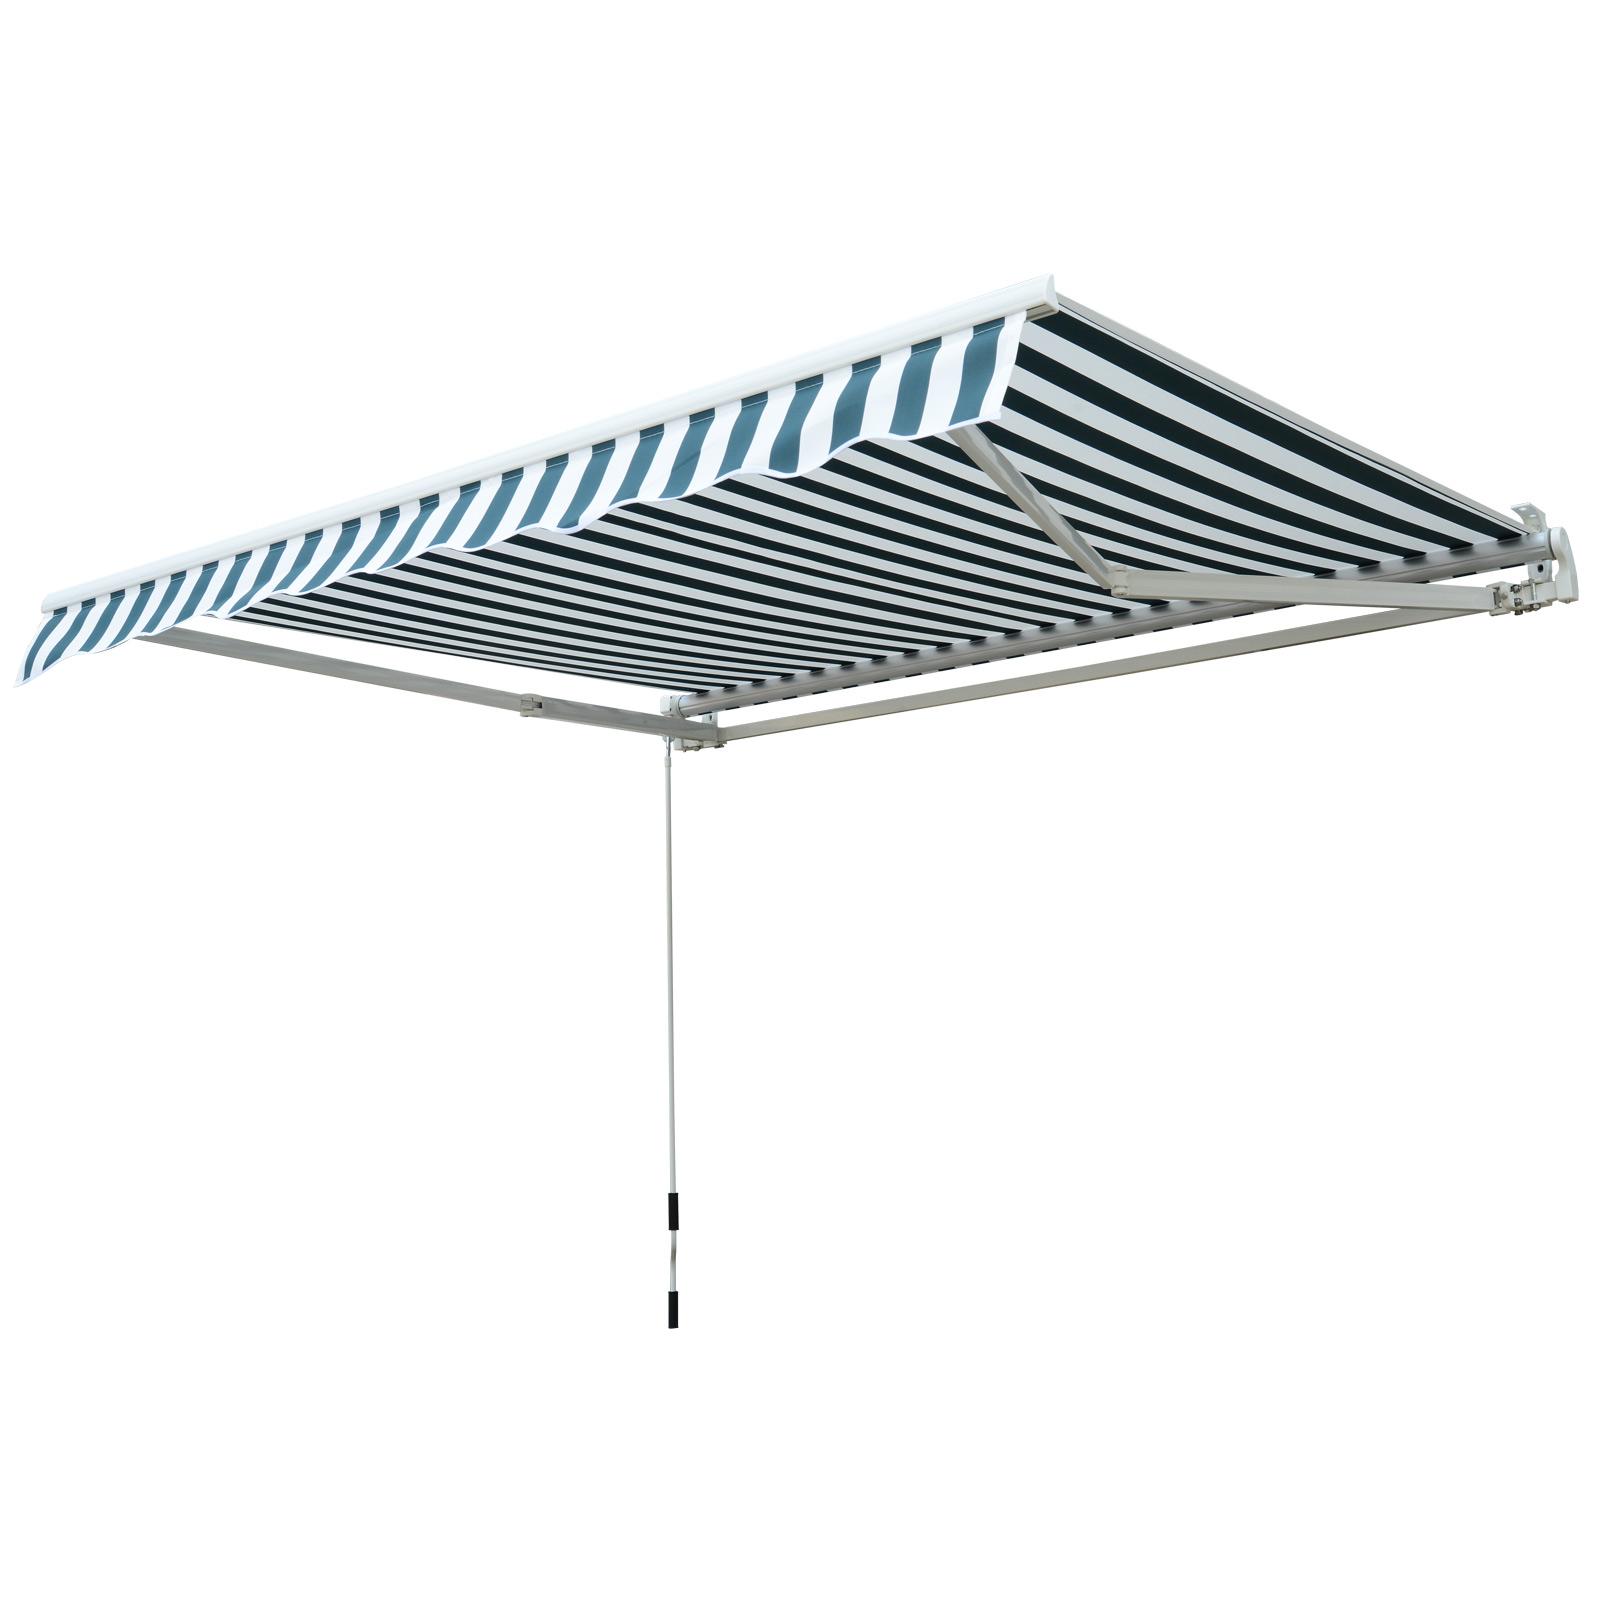 Garden-Patio-Manual-Awning-Canopy-Sun-Shade-Shelter-Retractable-4-Size-5-Colour thumbnail 24